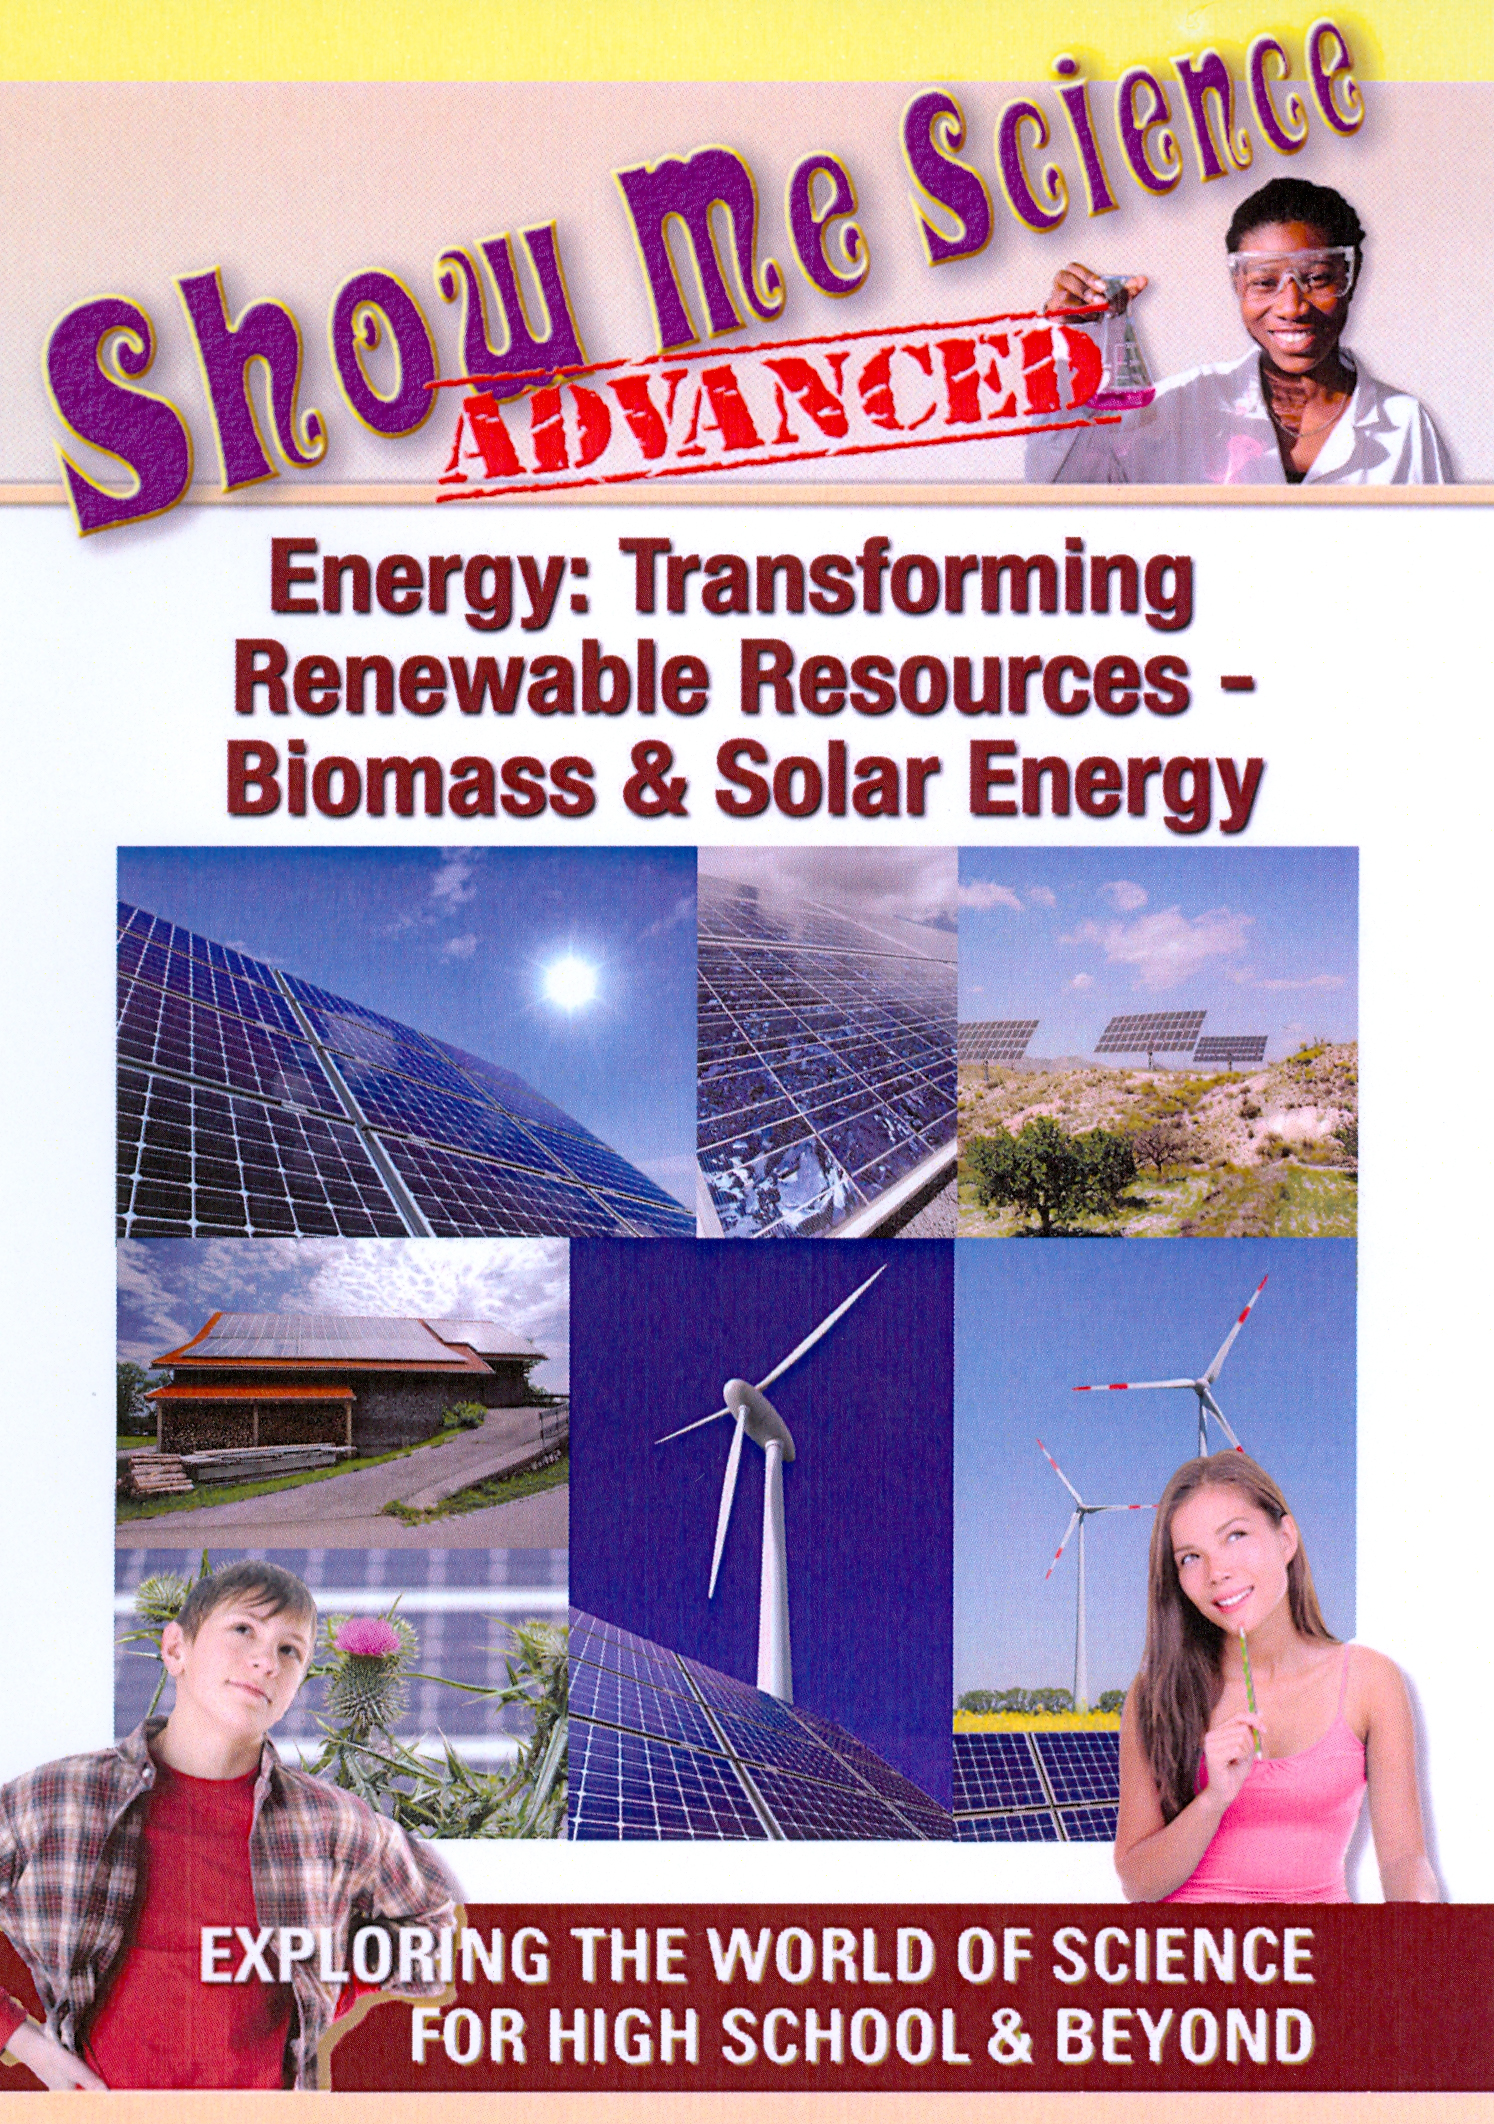 Show Me Science Advanced: Energy - Transforming Renewable Resources: Biomass & Solar Energy